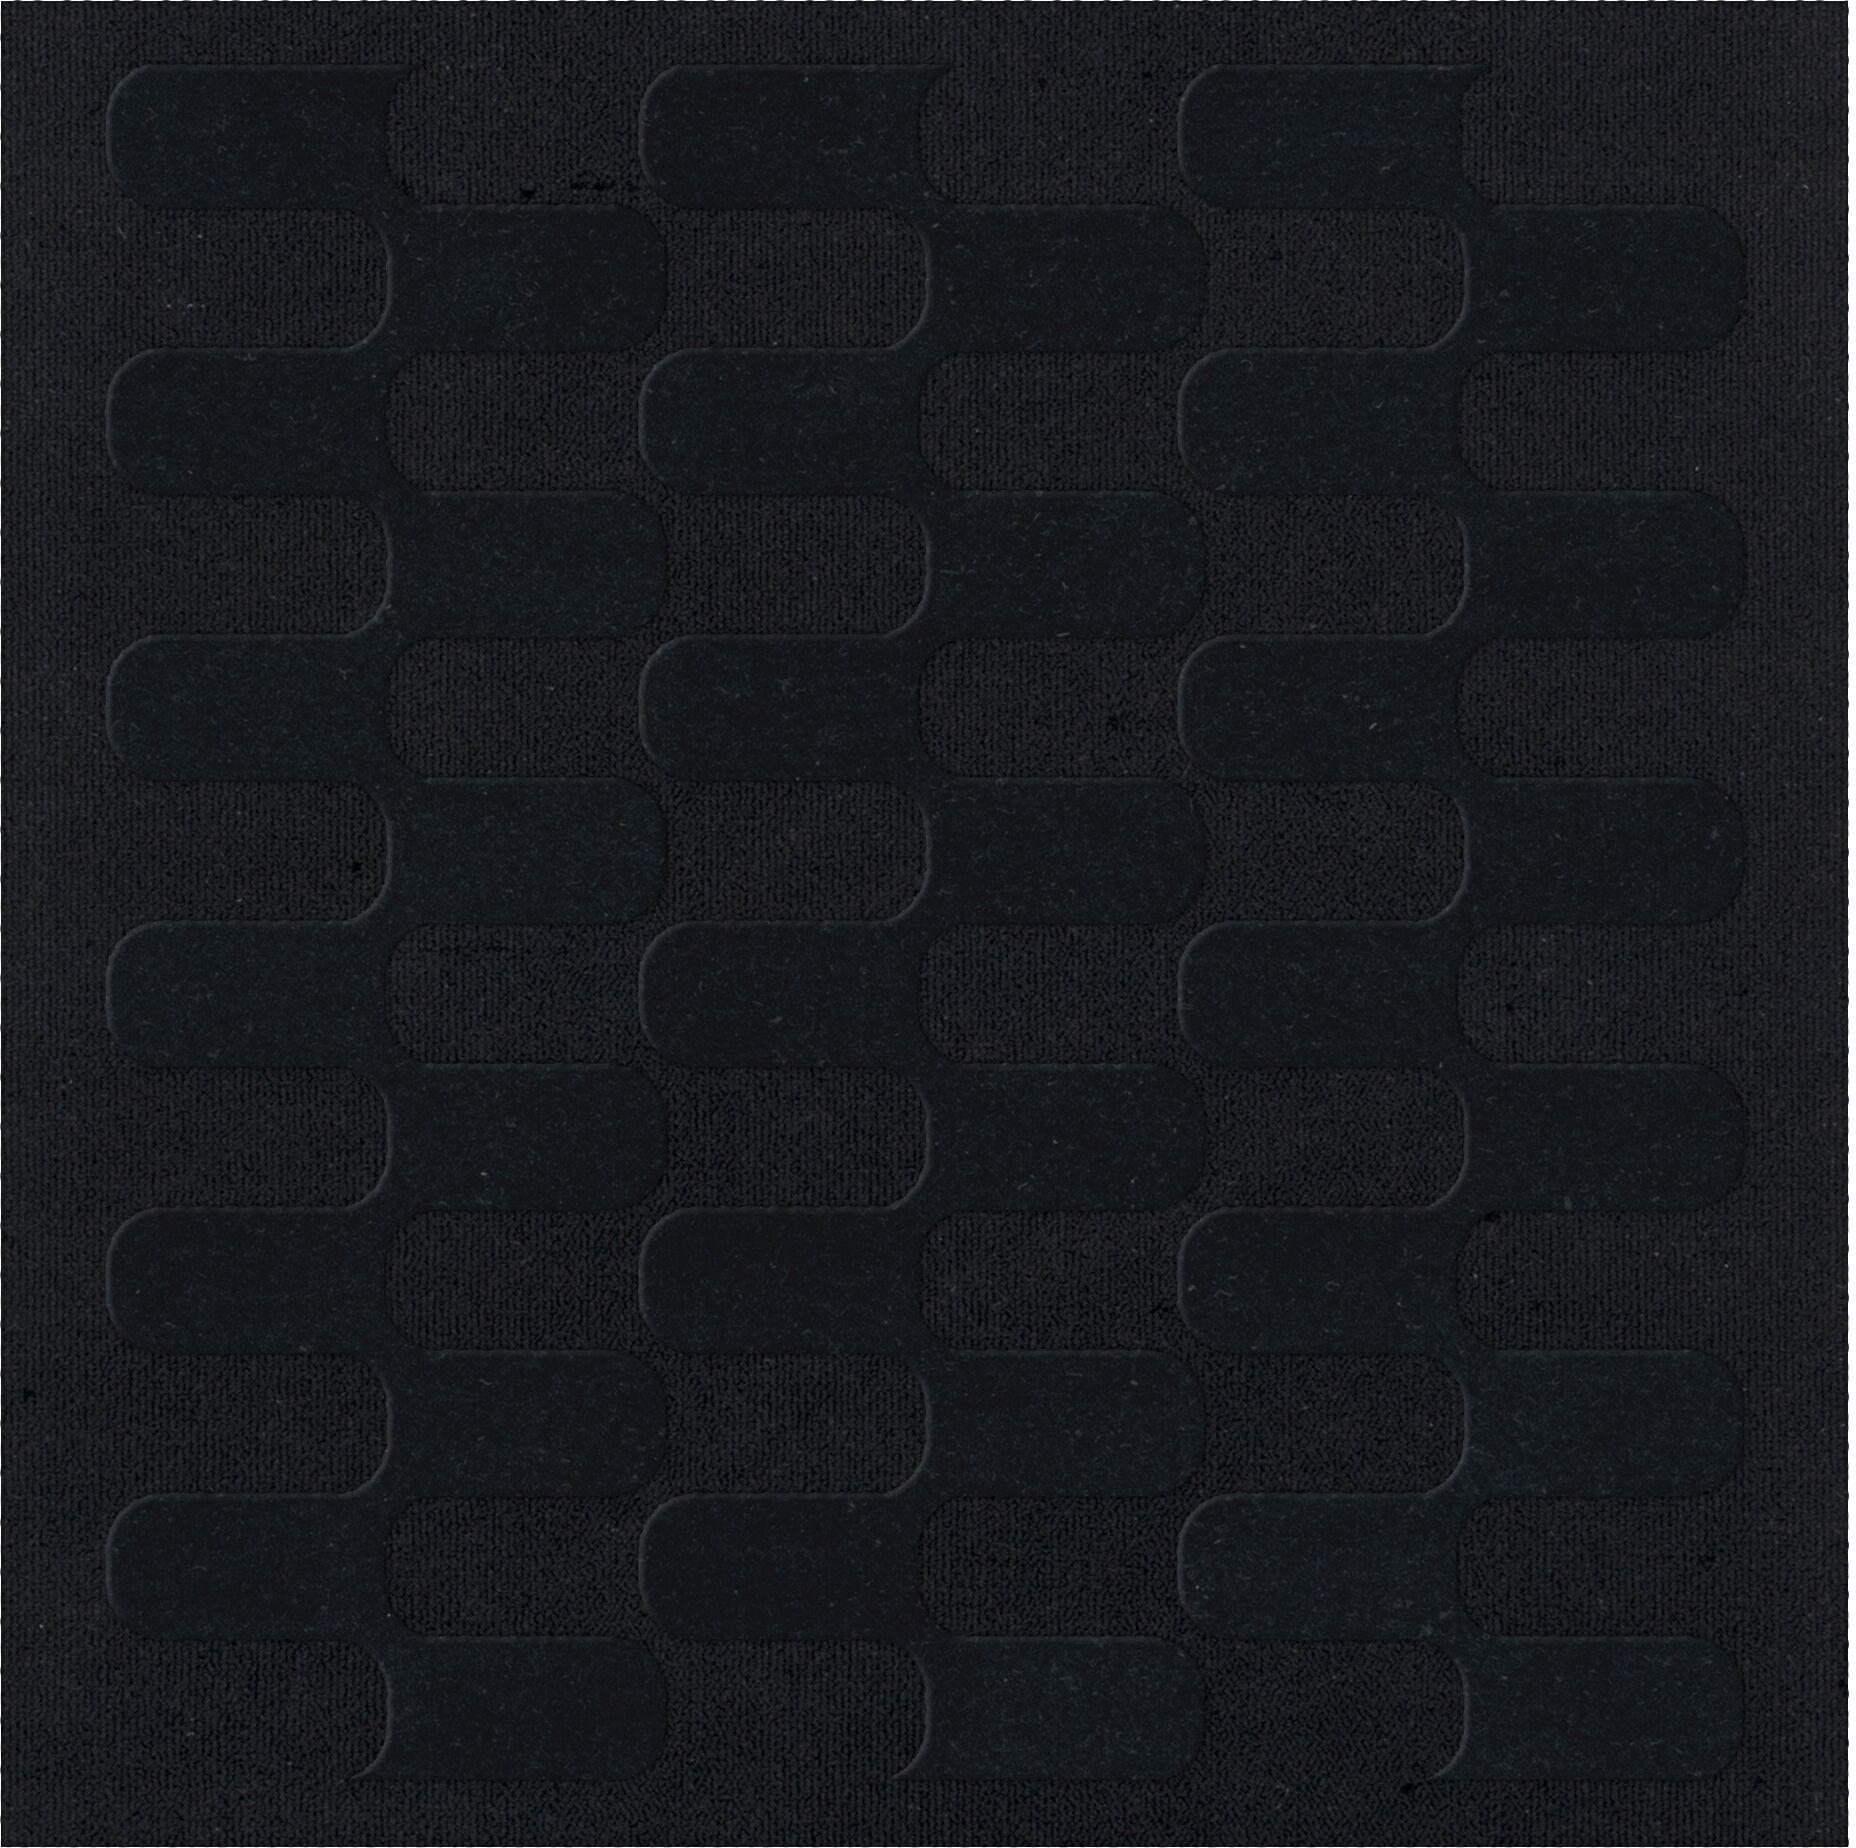 Dover Black Area Rug Rug Size: Square 4'